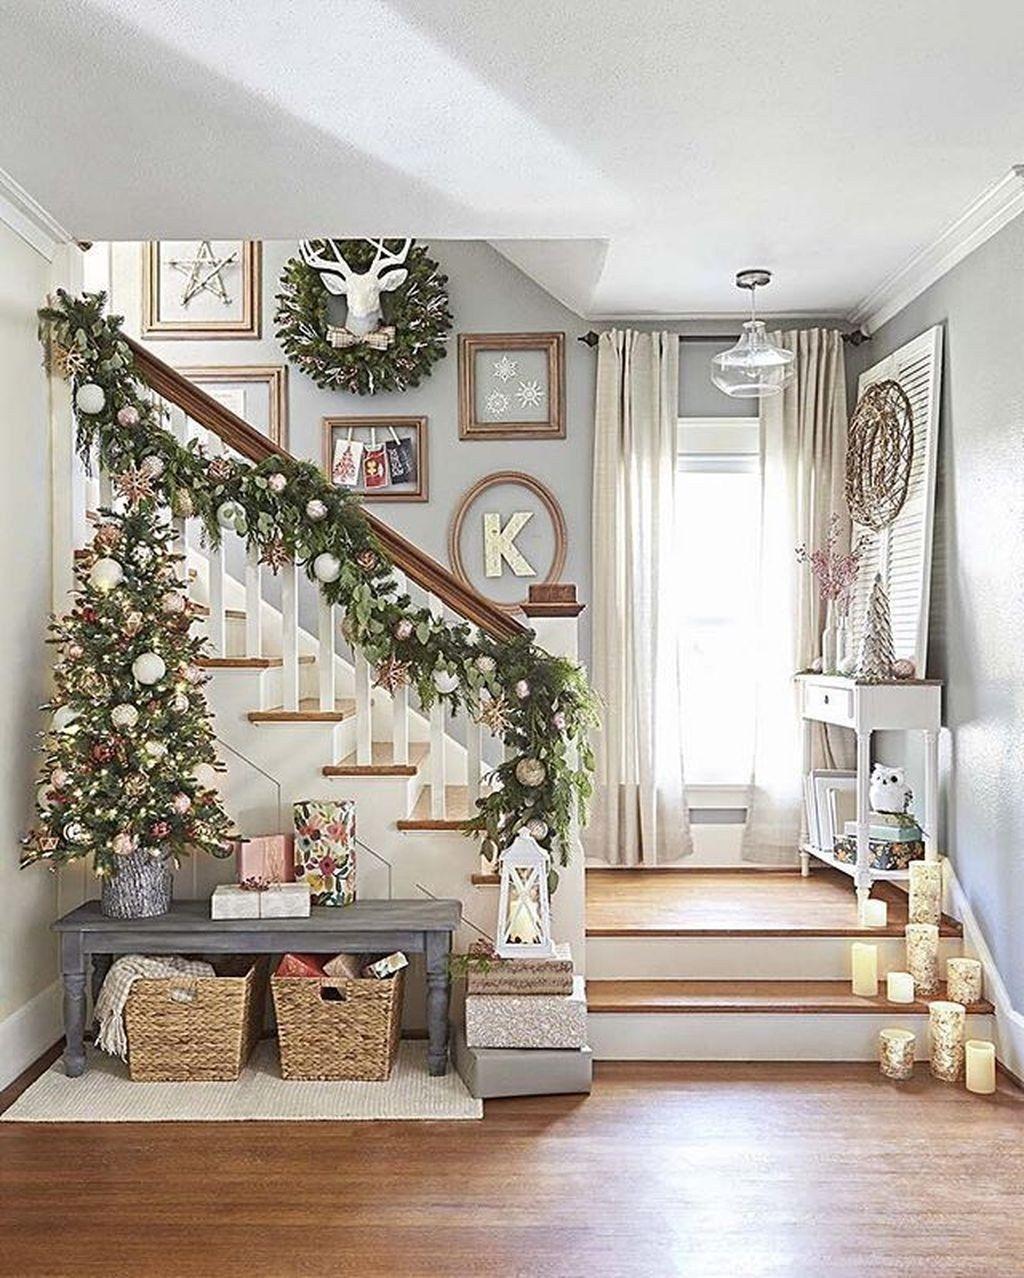 Unordinary Christmas Home Decor Ideas 02